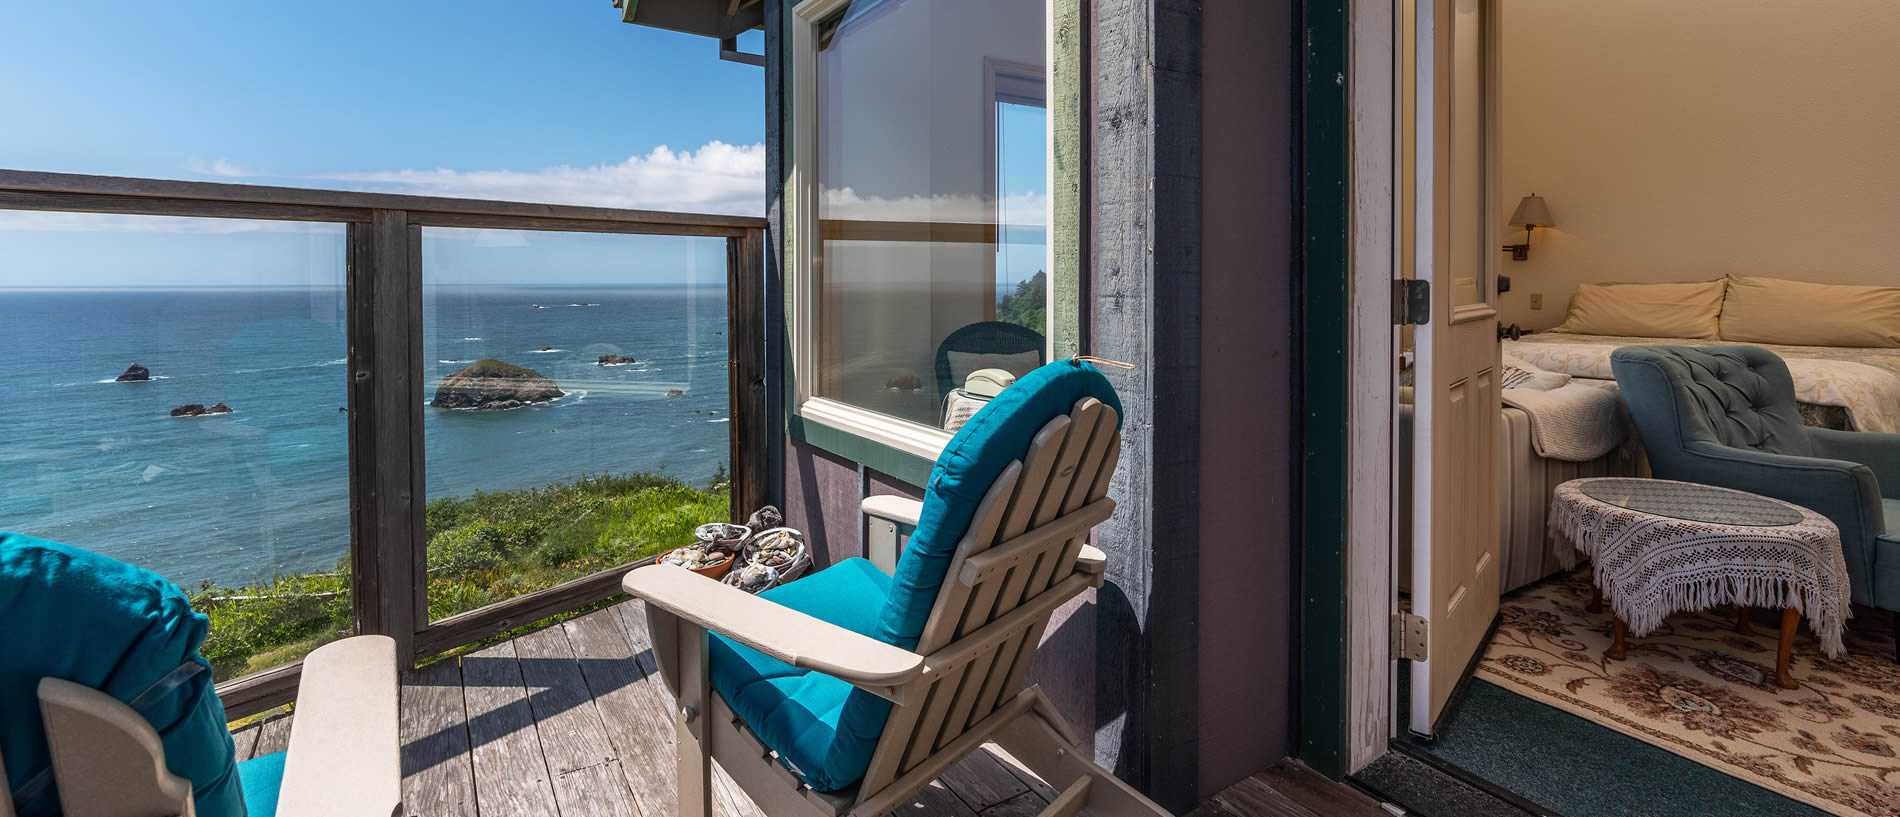 guestroom deck northern california coast bed and breakfast - oceanview lodging in trinidad ca